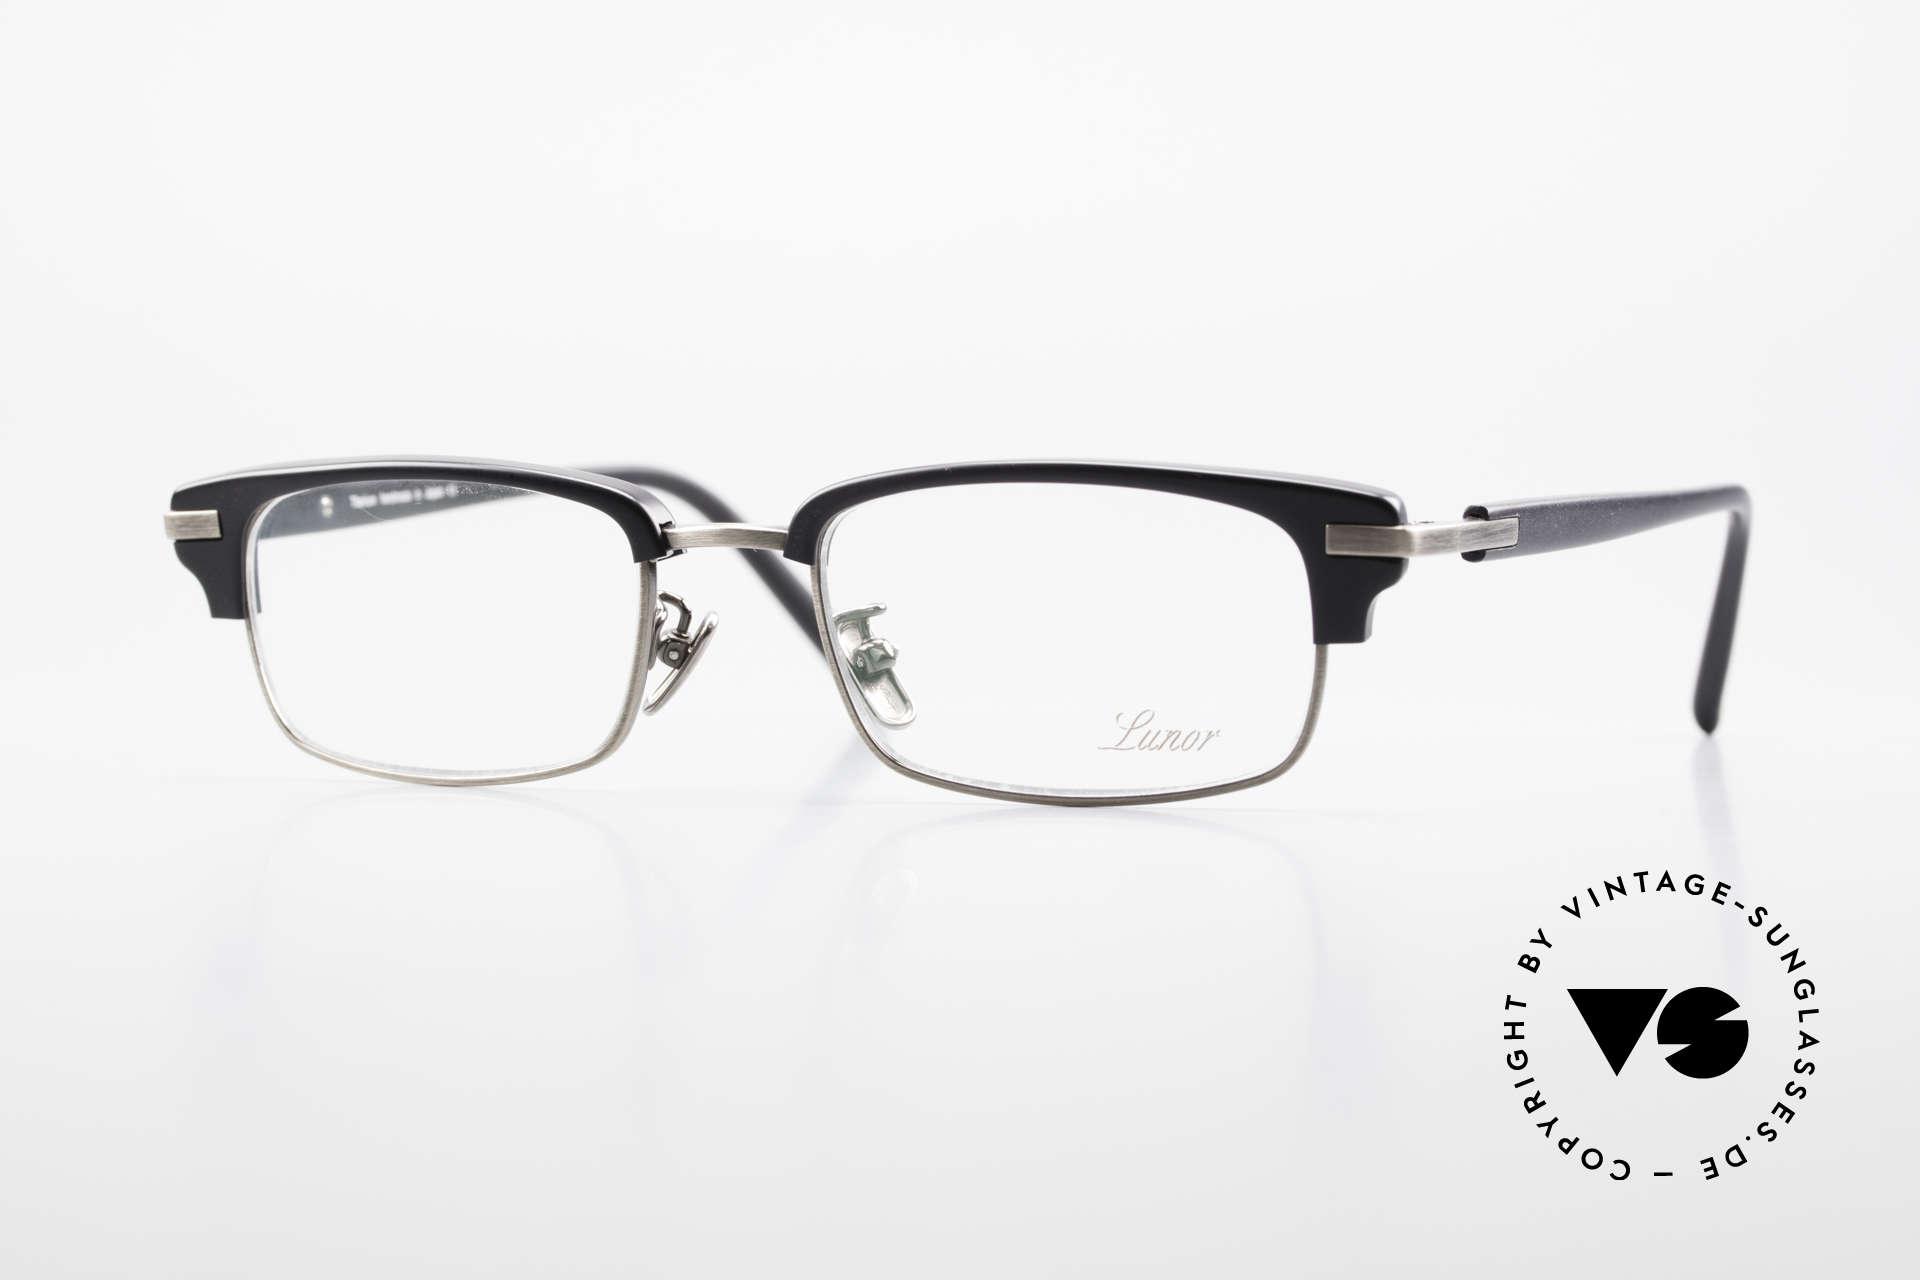 Lunor Combi II Mod 80 Combi Titanium Eyeglasses, Lunor Combi II model 80 AS (antique silver) eyeglasses, Made for Men and Women